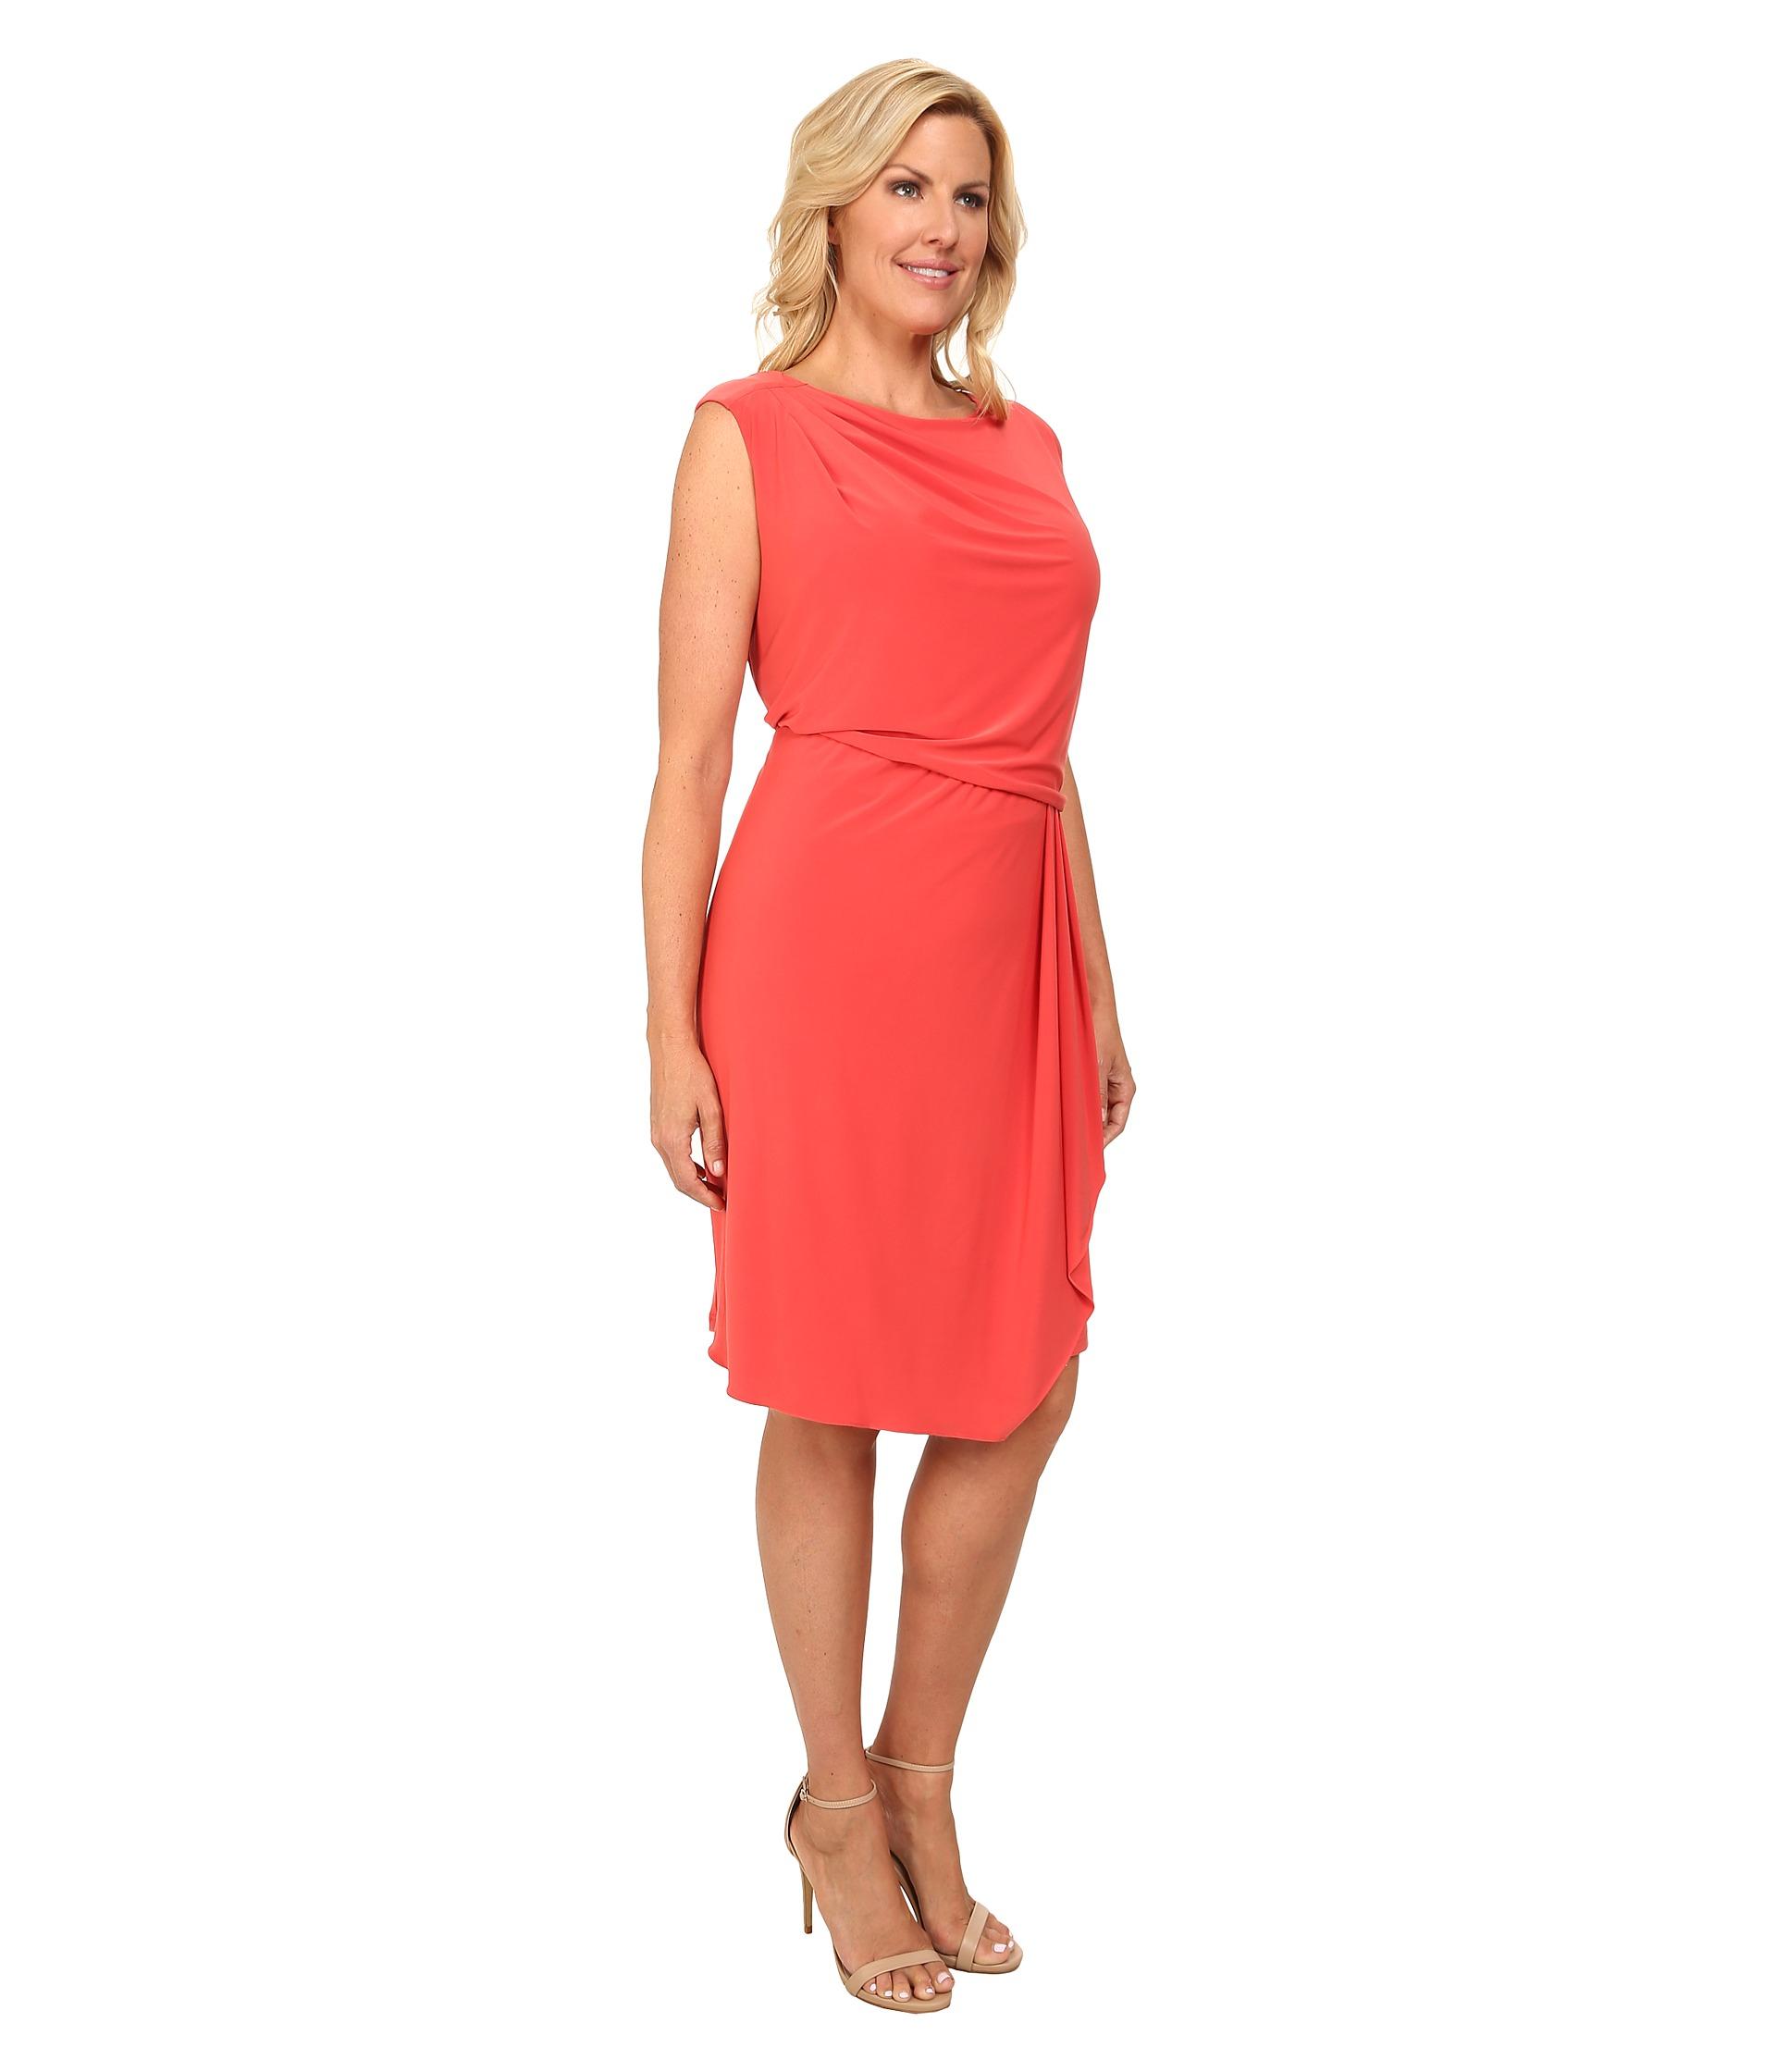 Asymmetric Drape Dress: Adrianna Papell Plus Size Asymmetrical Drape Jersey